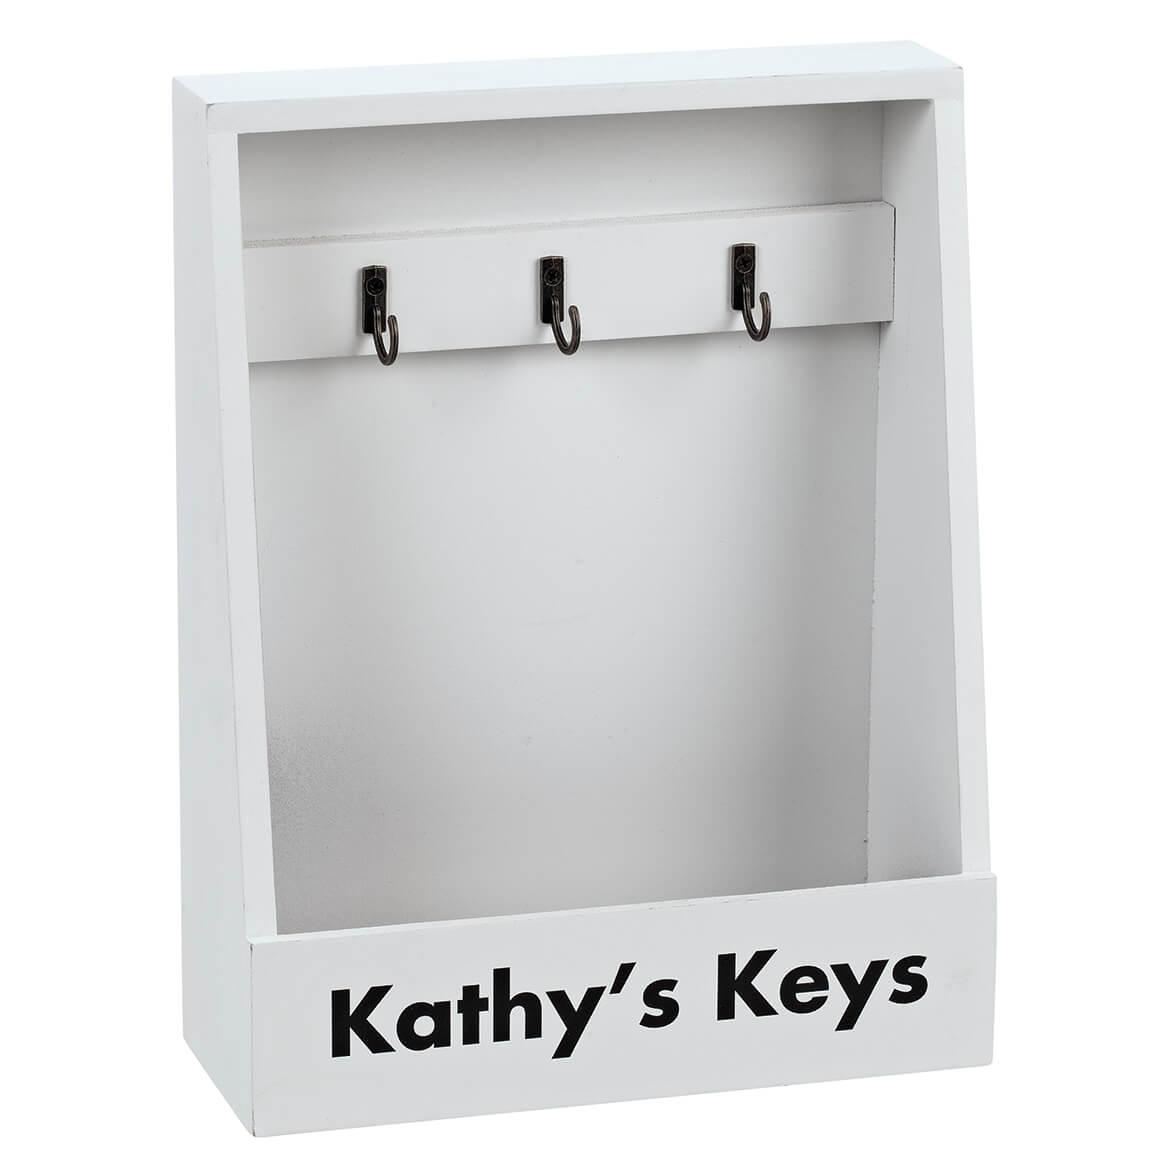 Personalized Wall Key Caddy-371242